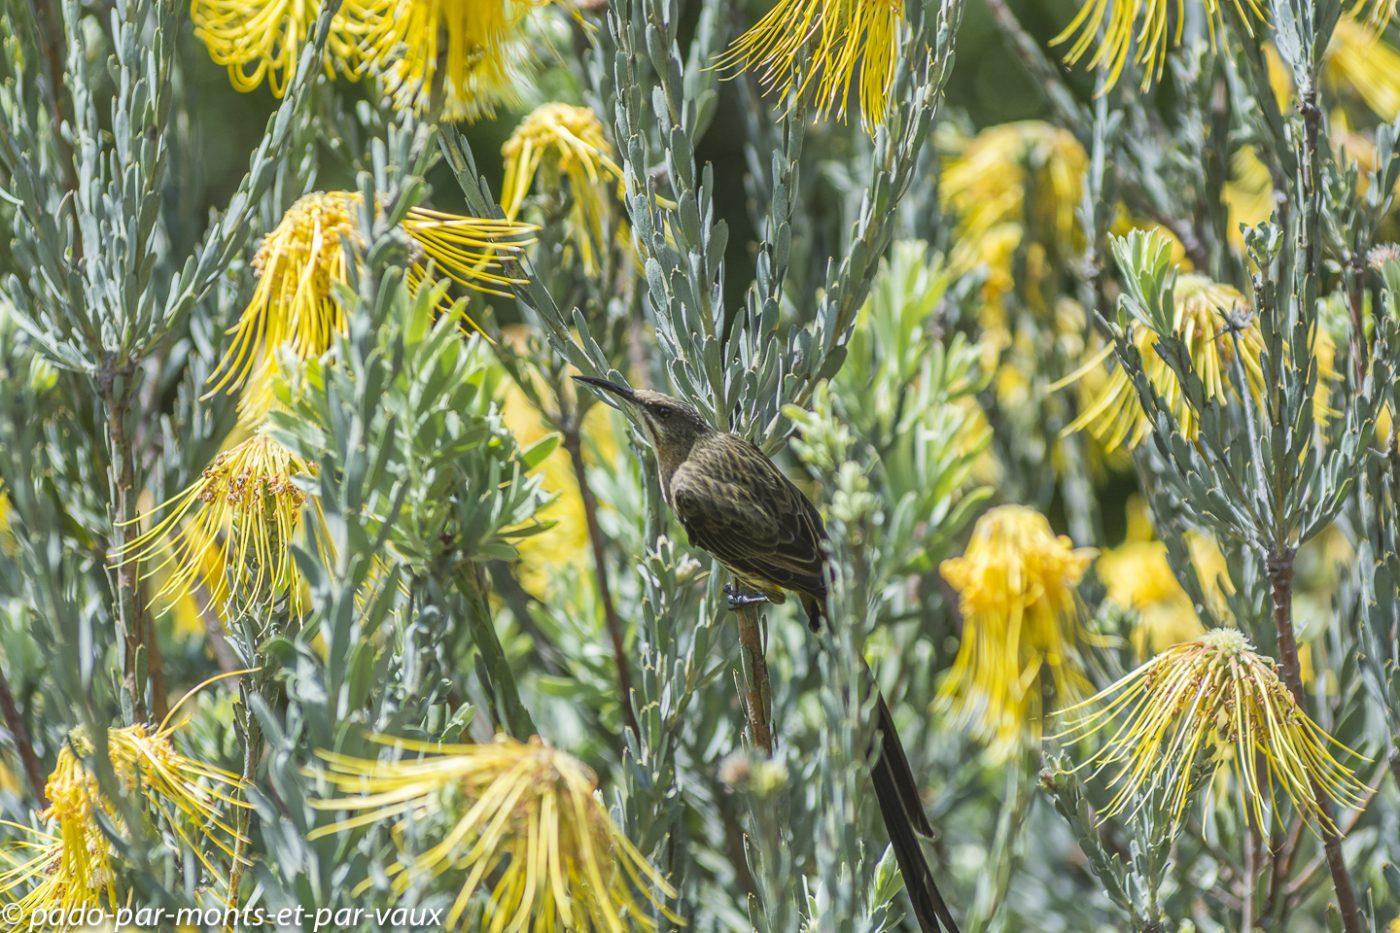 Kirstenbosch garden - Promerops